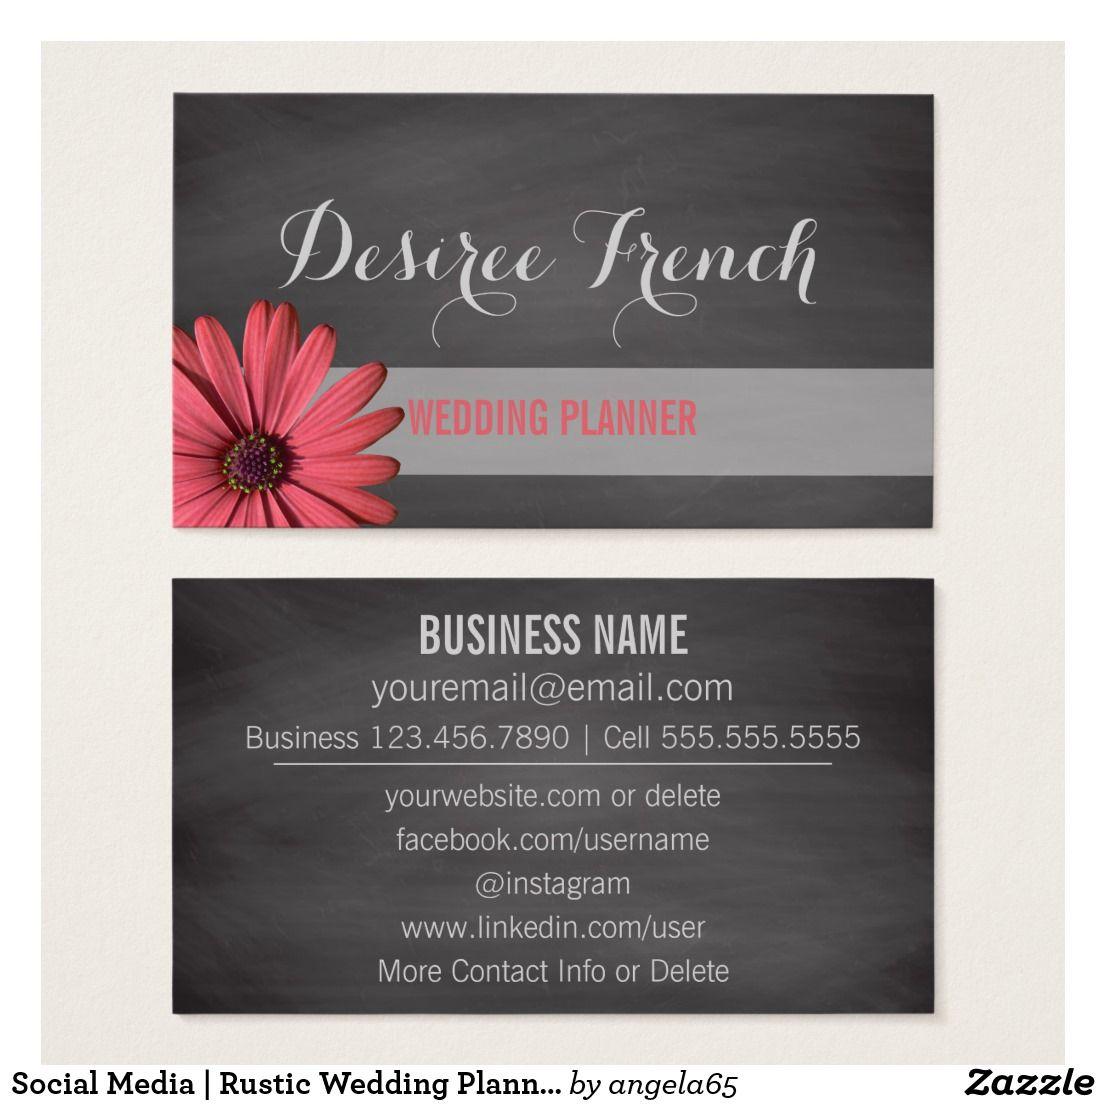 Social Media Rustic Wedding Planner Chalkboard Business Card Zazzle Com Wedding Business Card Wedding Planner Business Printing Business Cards